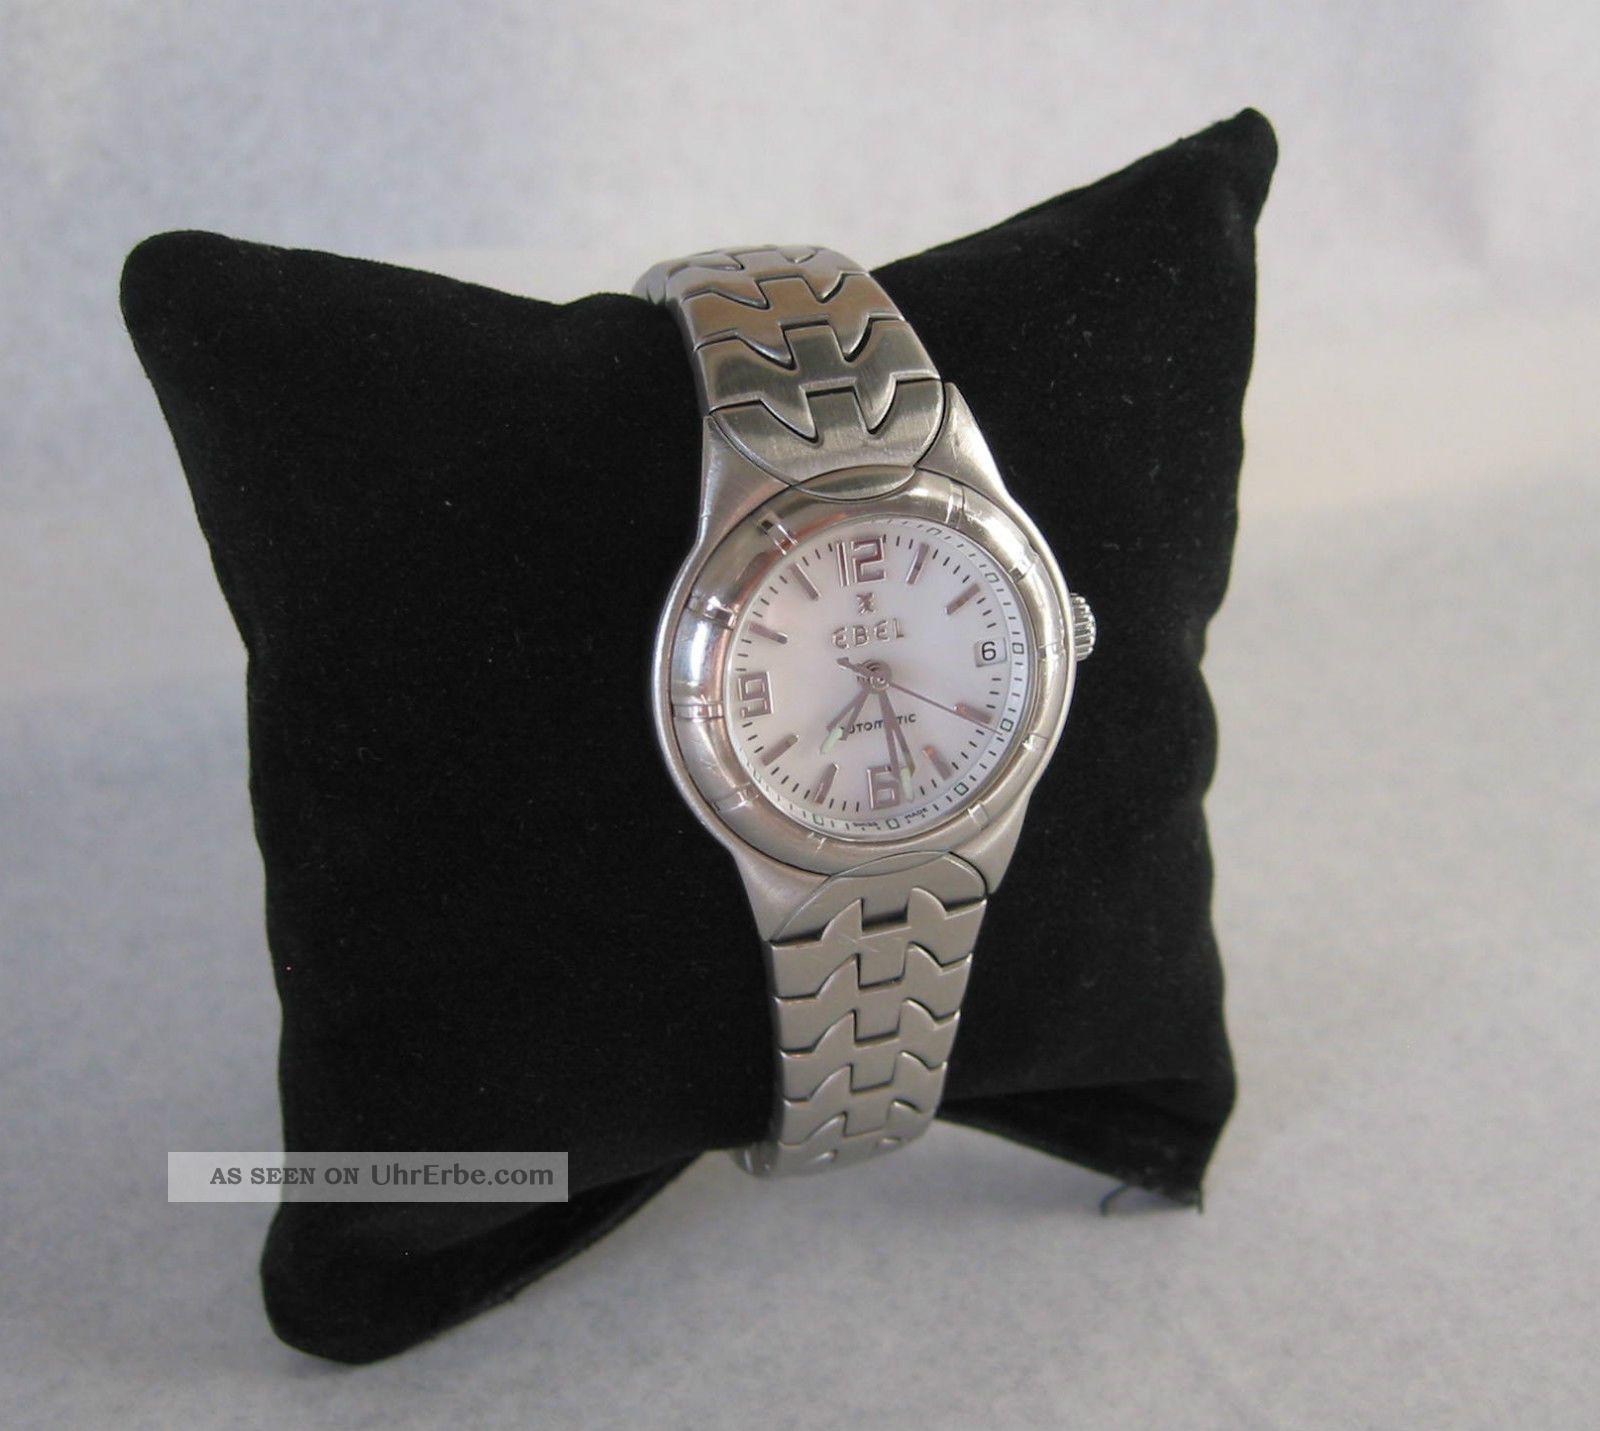 Ebel Automatic Typ E Uhr Damen 28 Mm Armbanduhr Zifferblatt Weiß Armbanduhren Bild